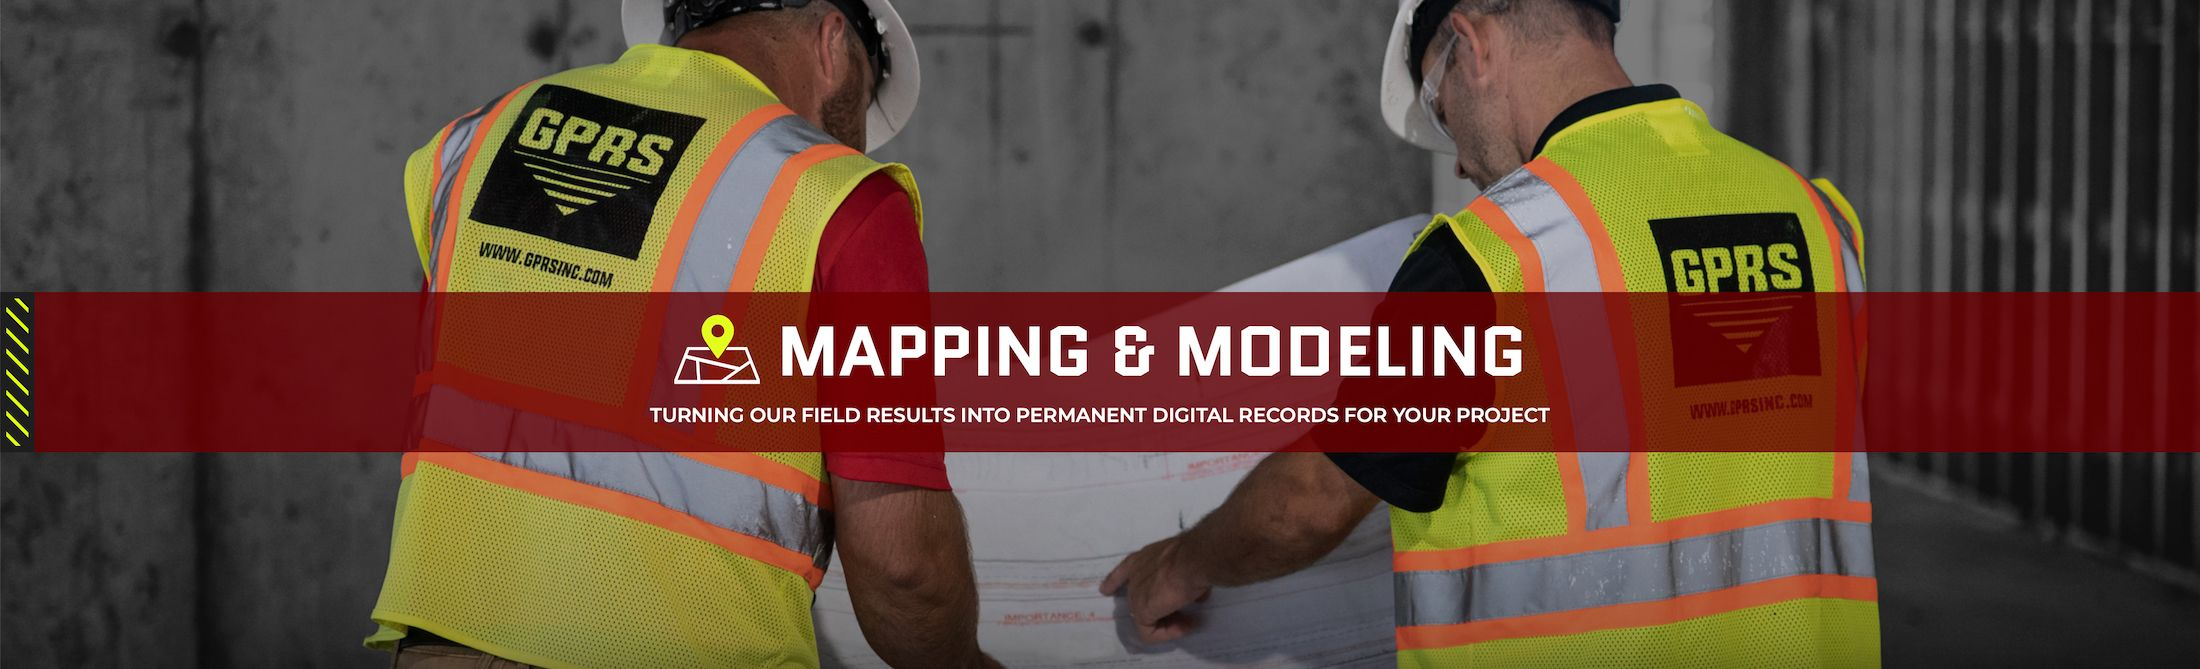 4-mapping-modeling.jpg